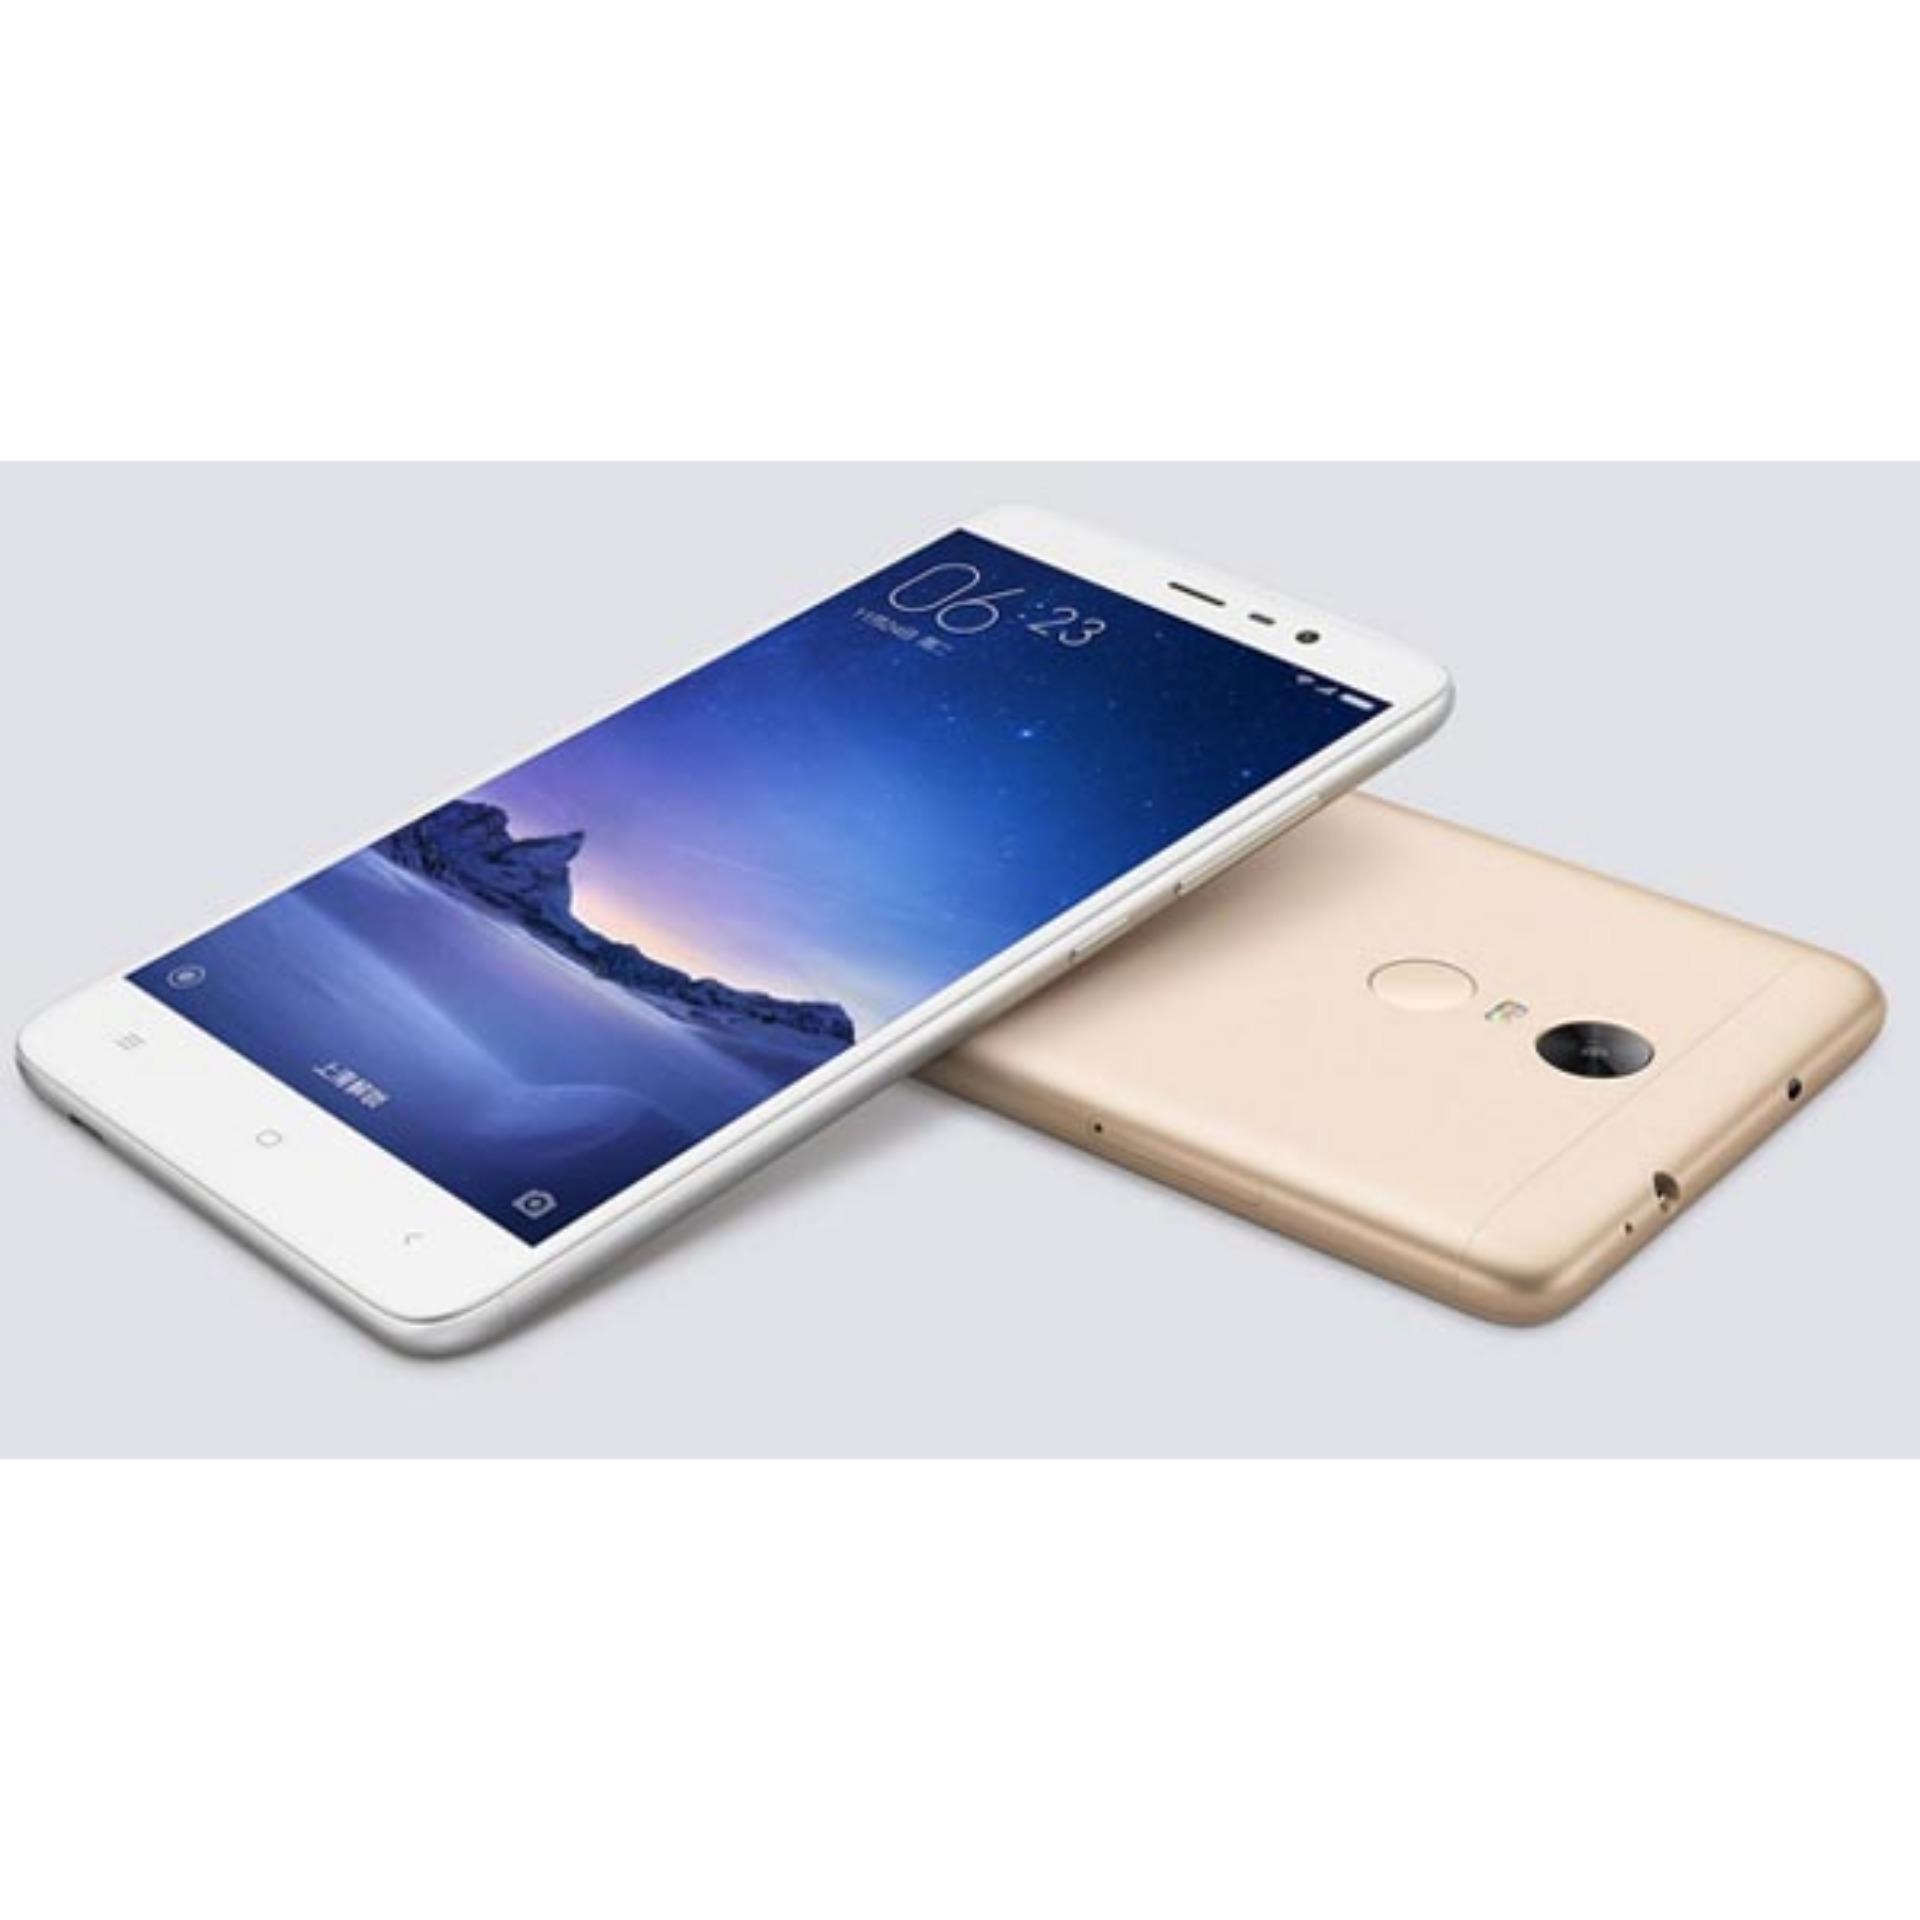 Pelacakan Harga Xiaomi Redmi Note 4x 4g Global Version Ram 3gb Rom 32gb White Gold